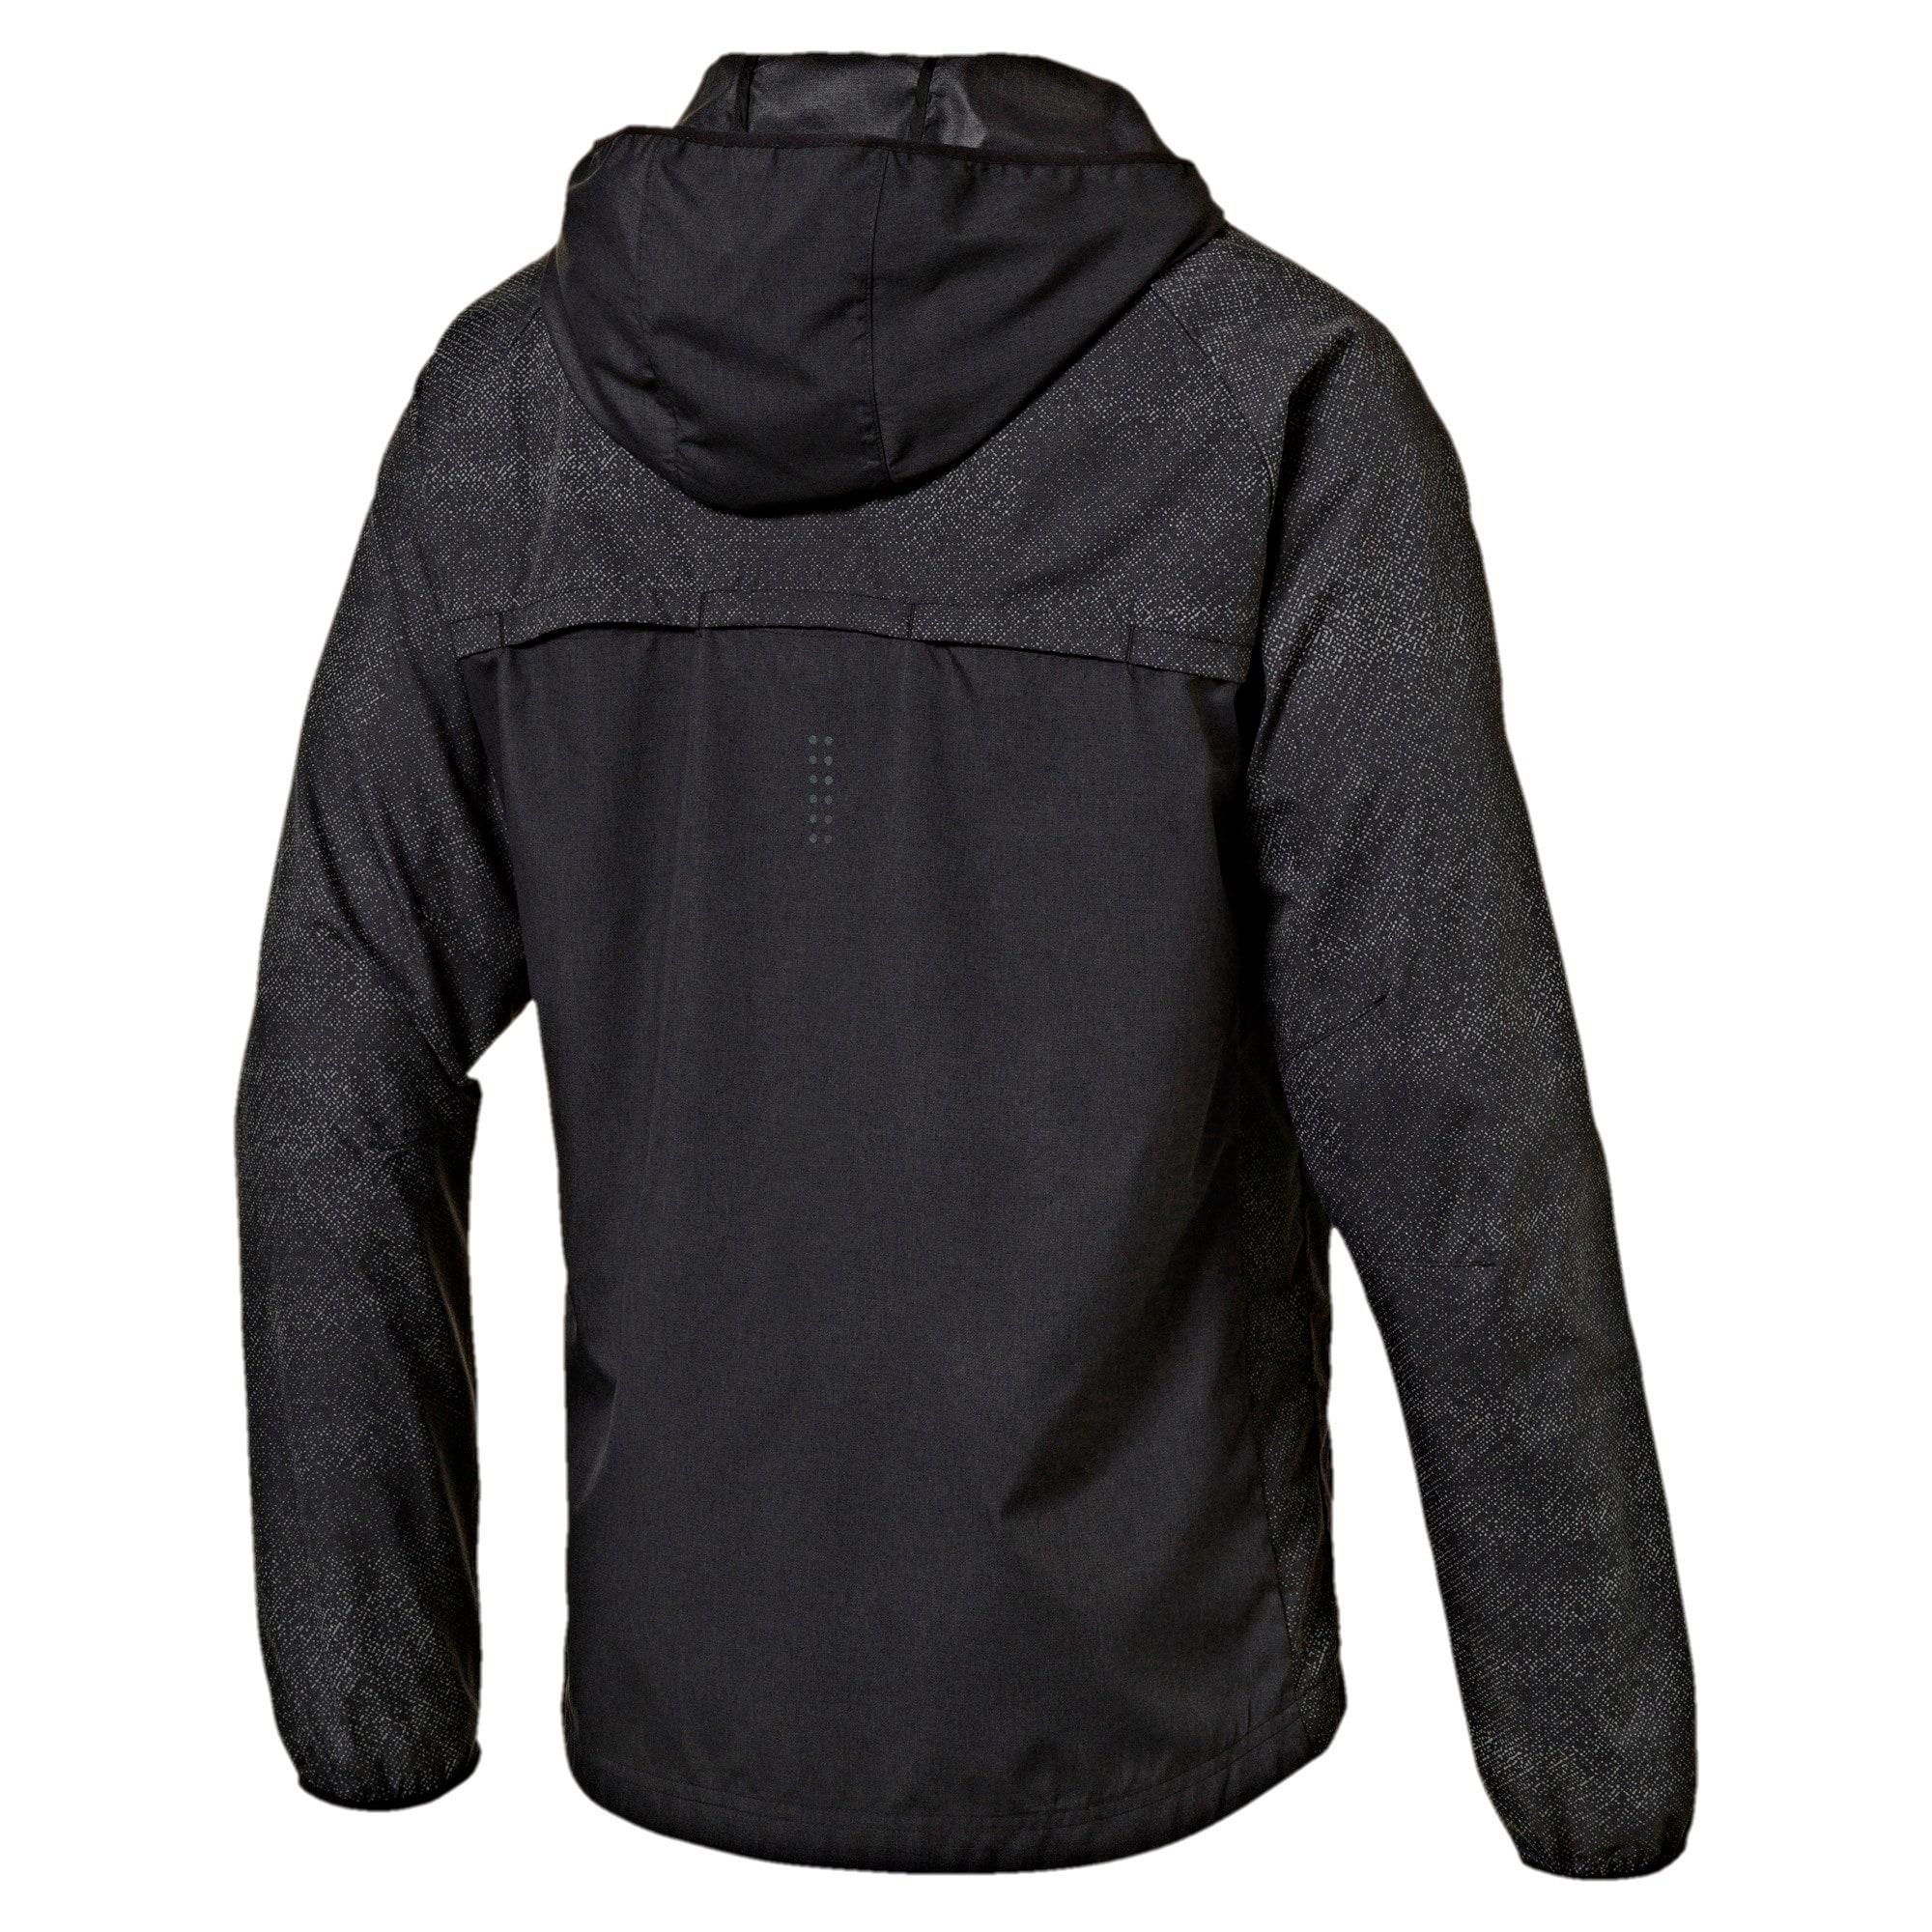 Thumbnail 4 of Running Men's NightCat Jacket, Puma Black Heather, medium-IND